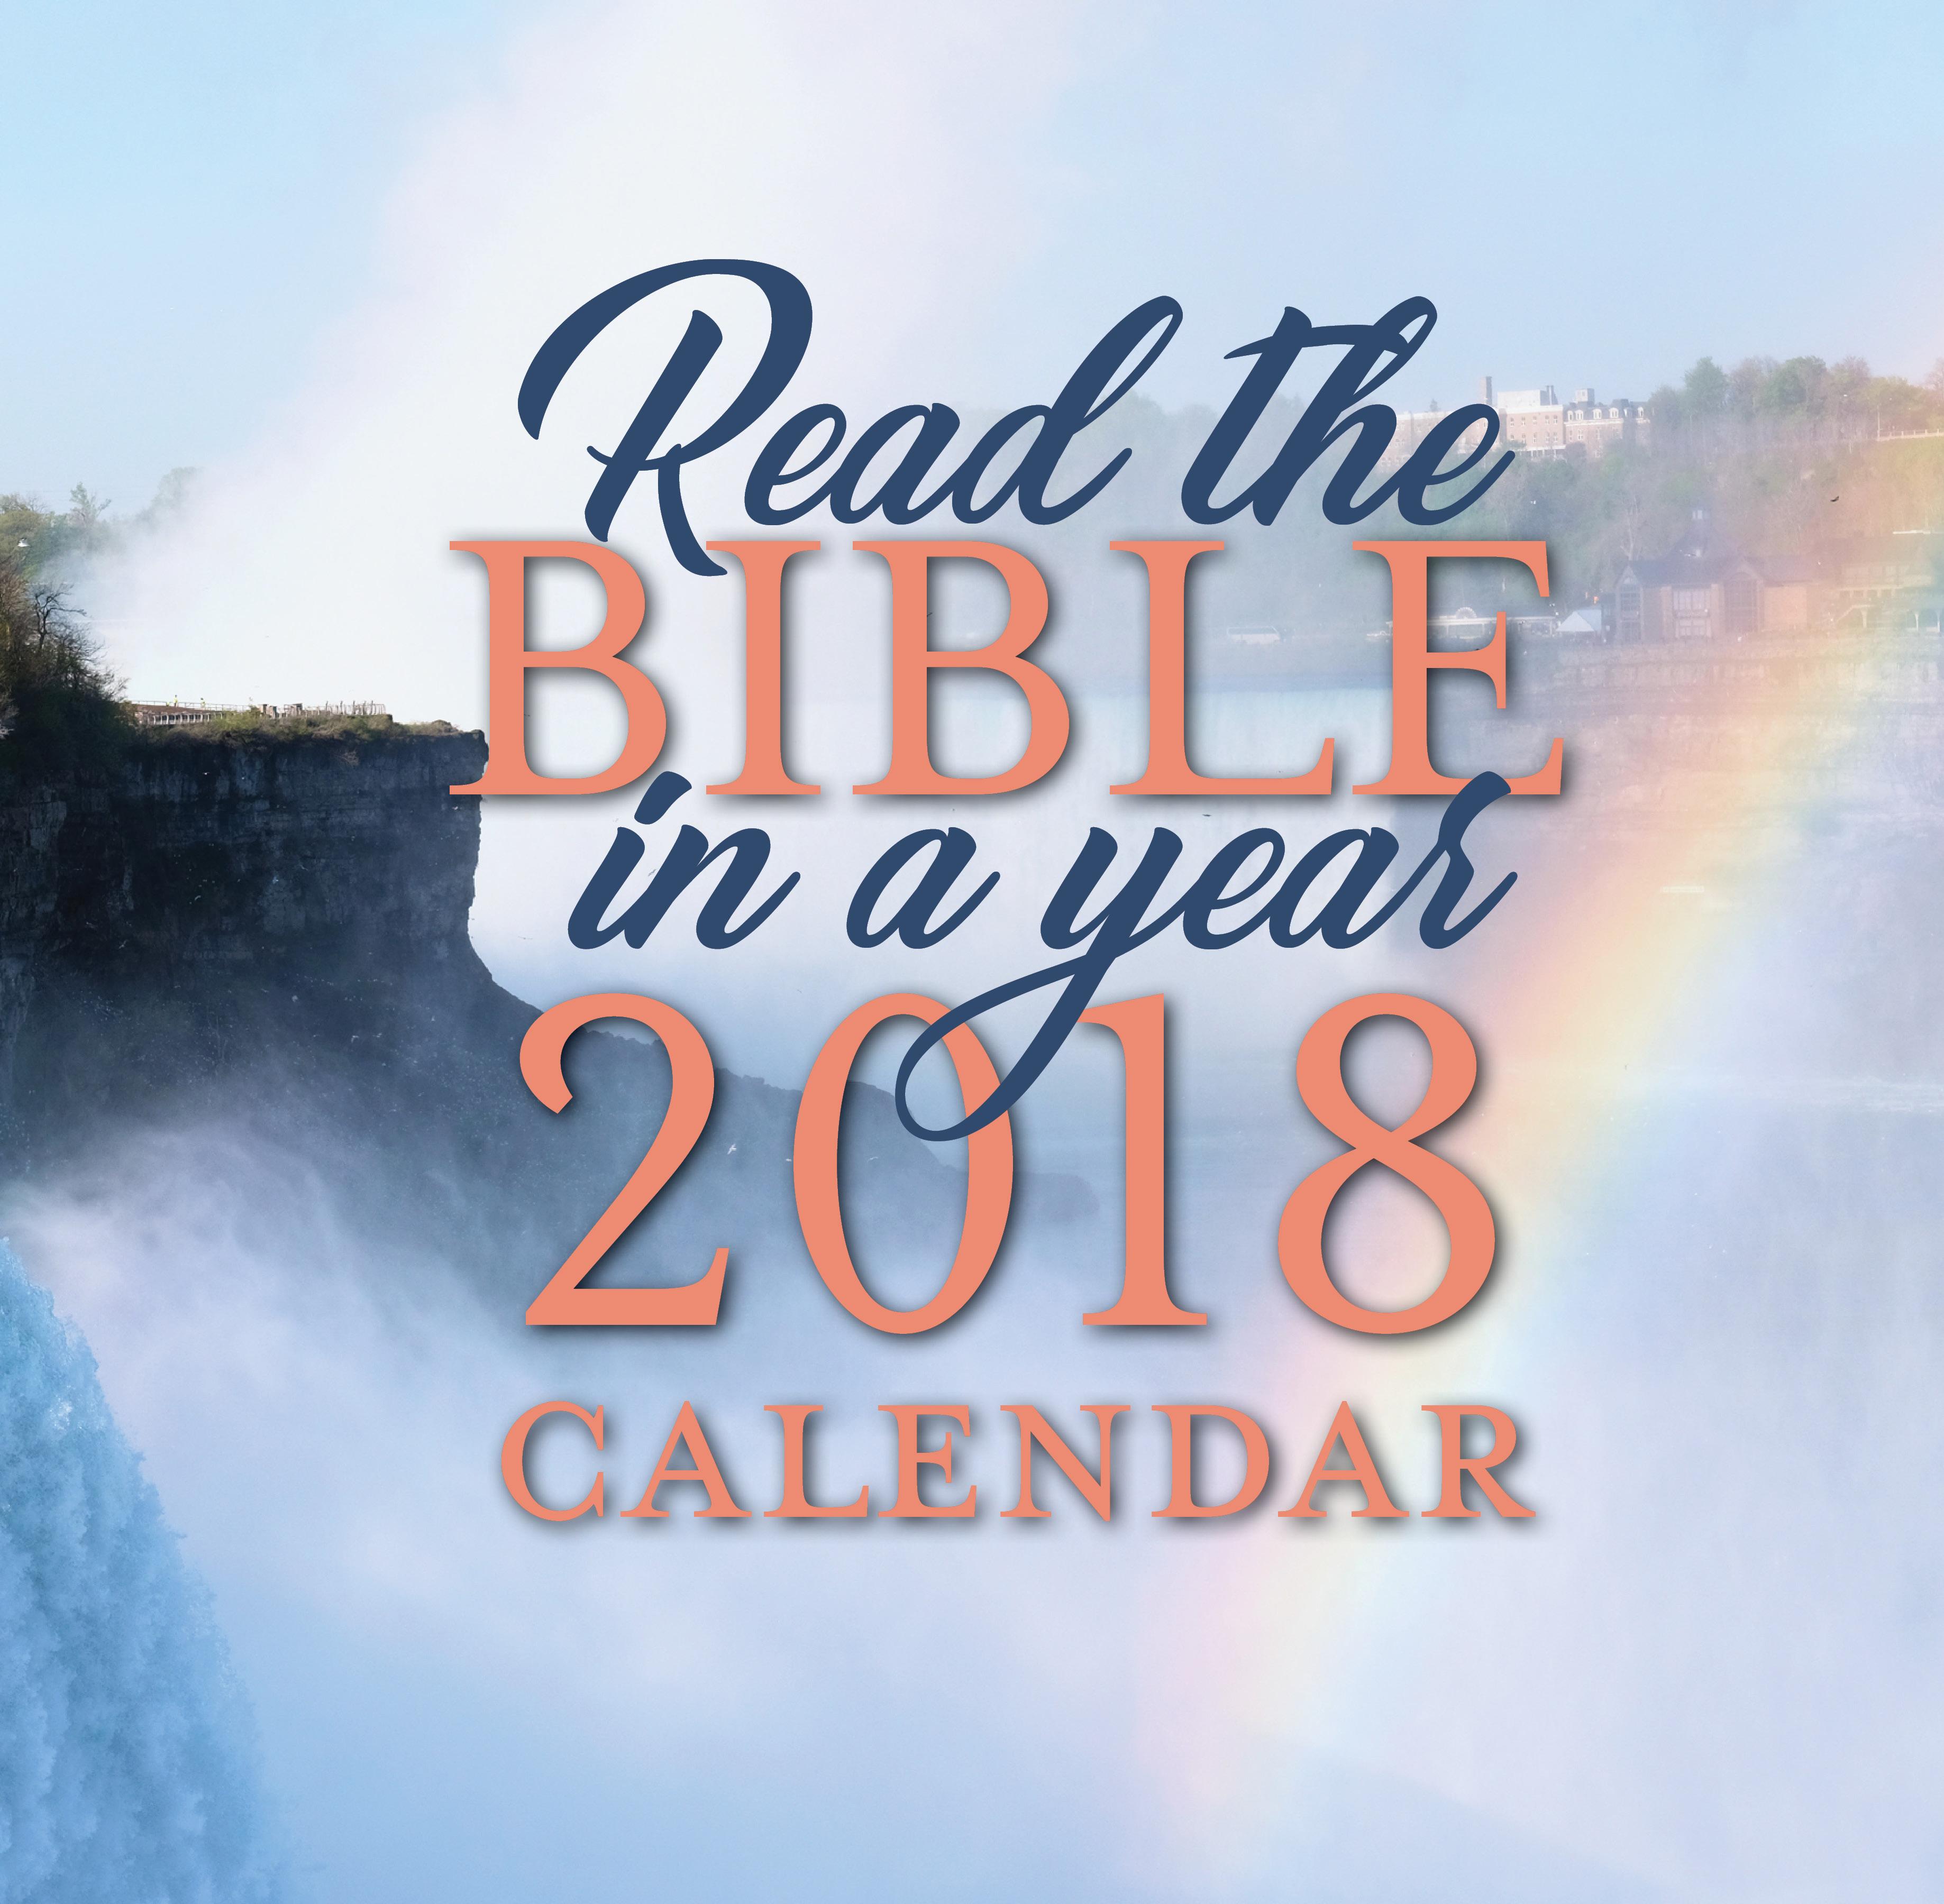 Bible Calendars 2018 2018 Bible Verse Calendar